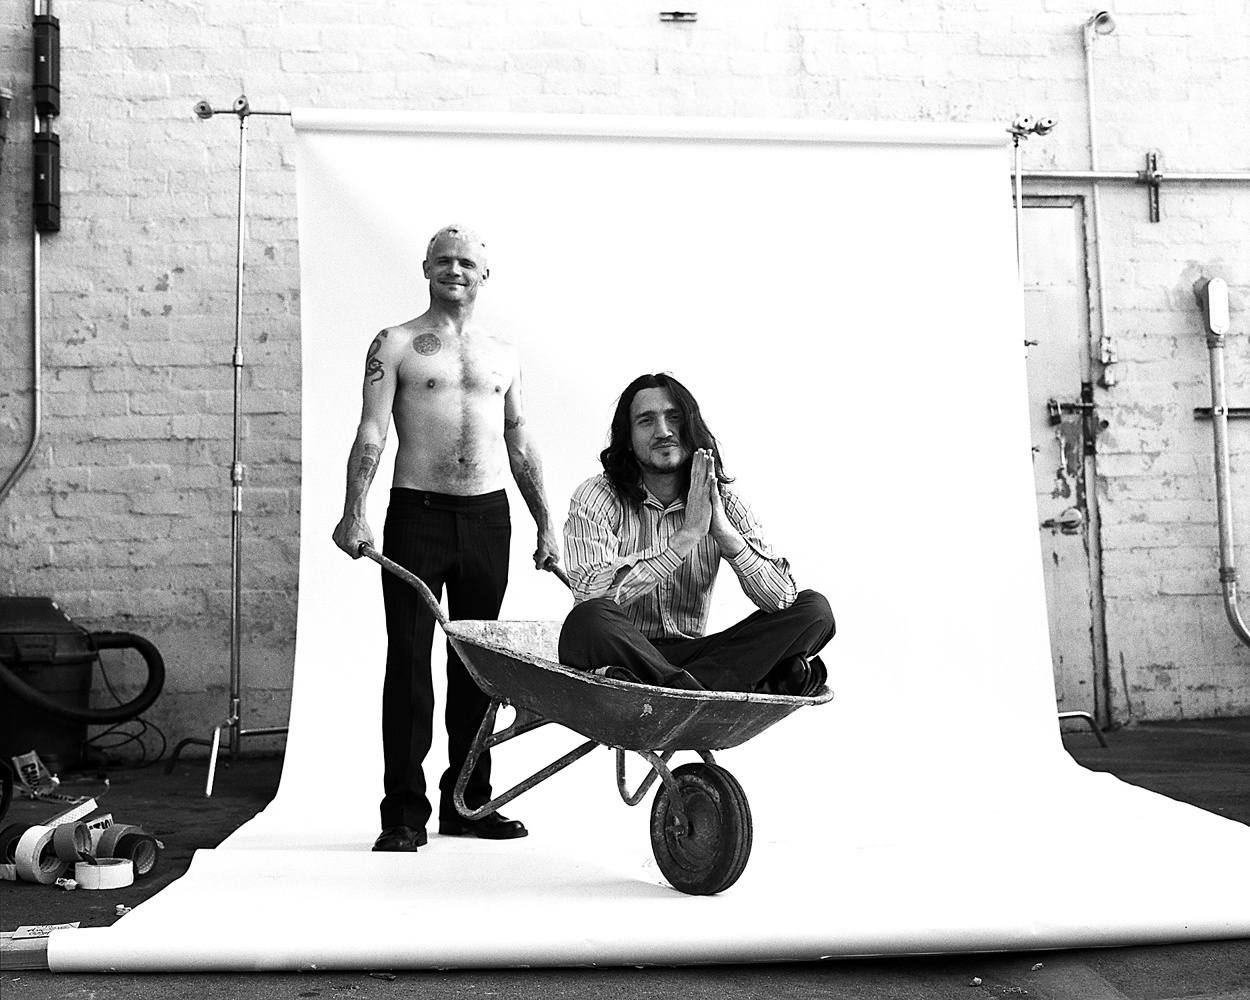 Flea and John Frusciante